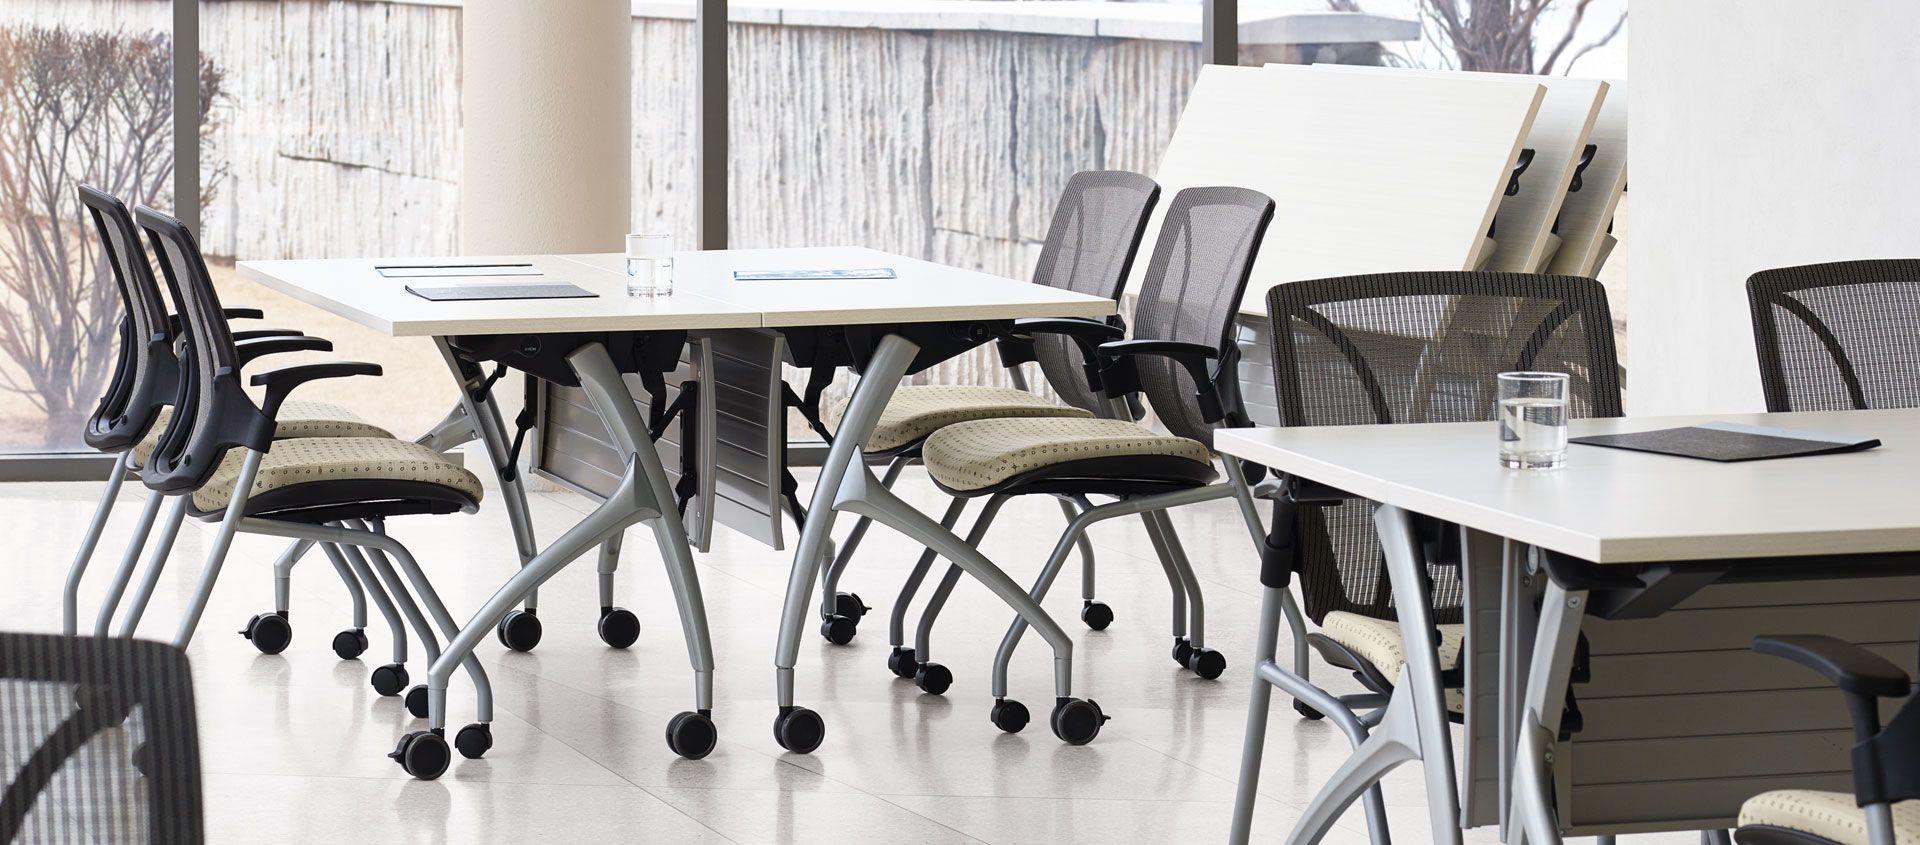 Meet 2gether Roma Lindsey Office Furniture Www Lindseyfurniture